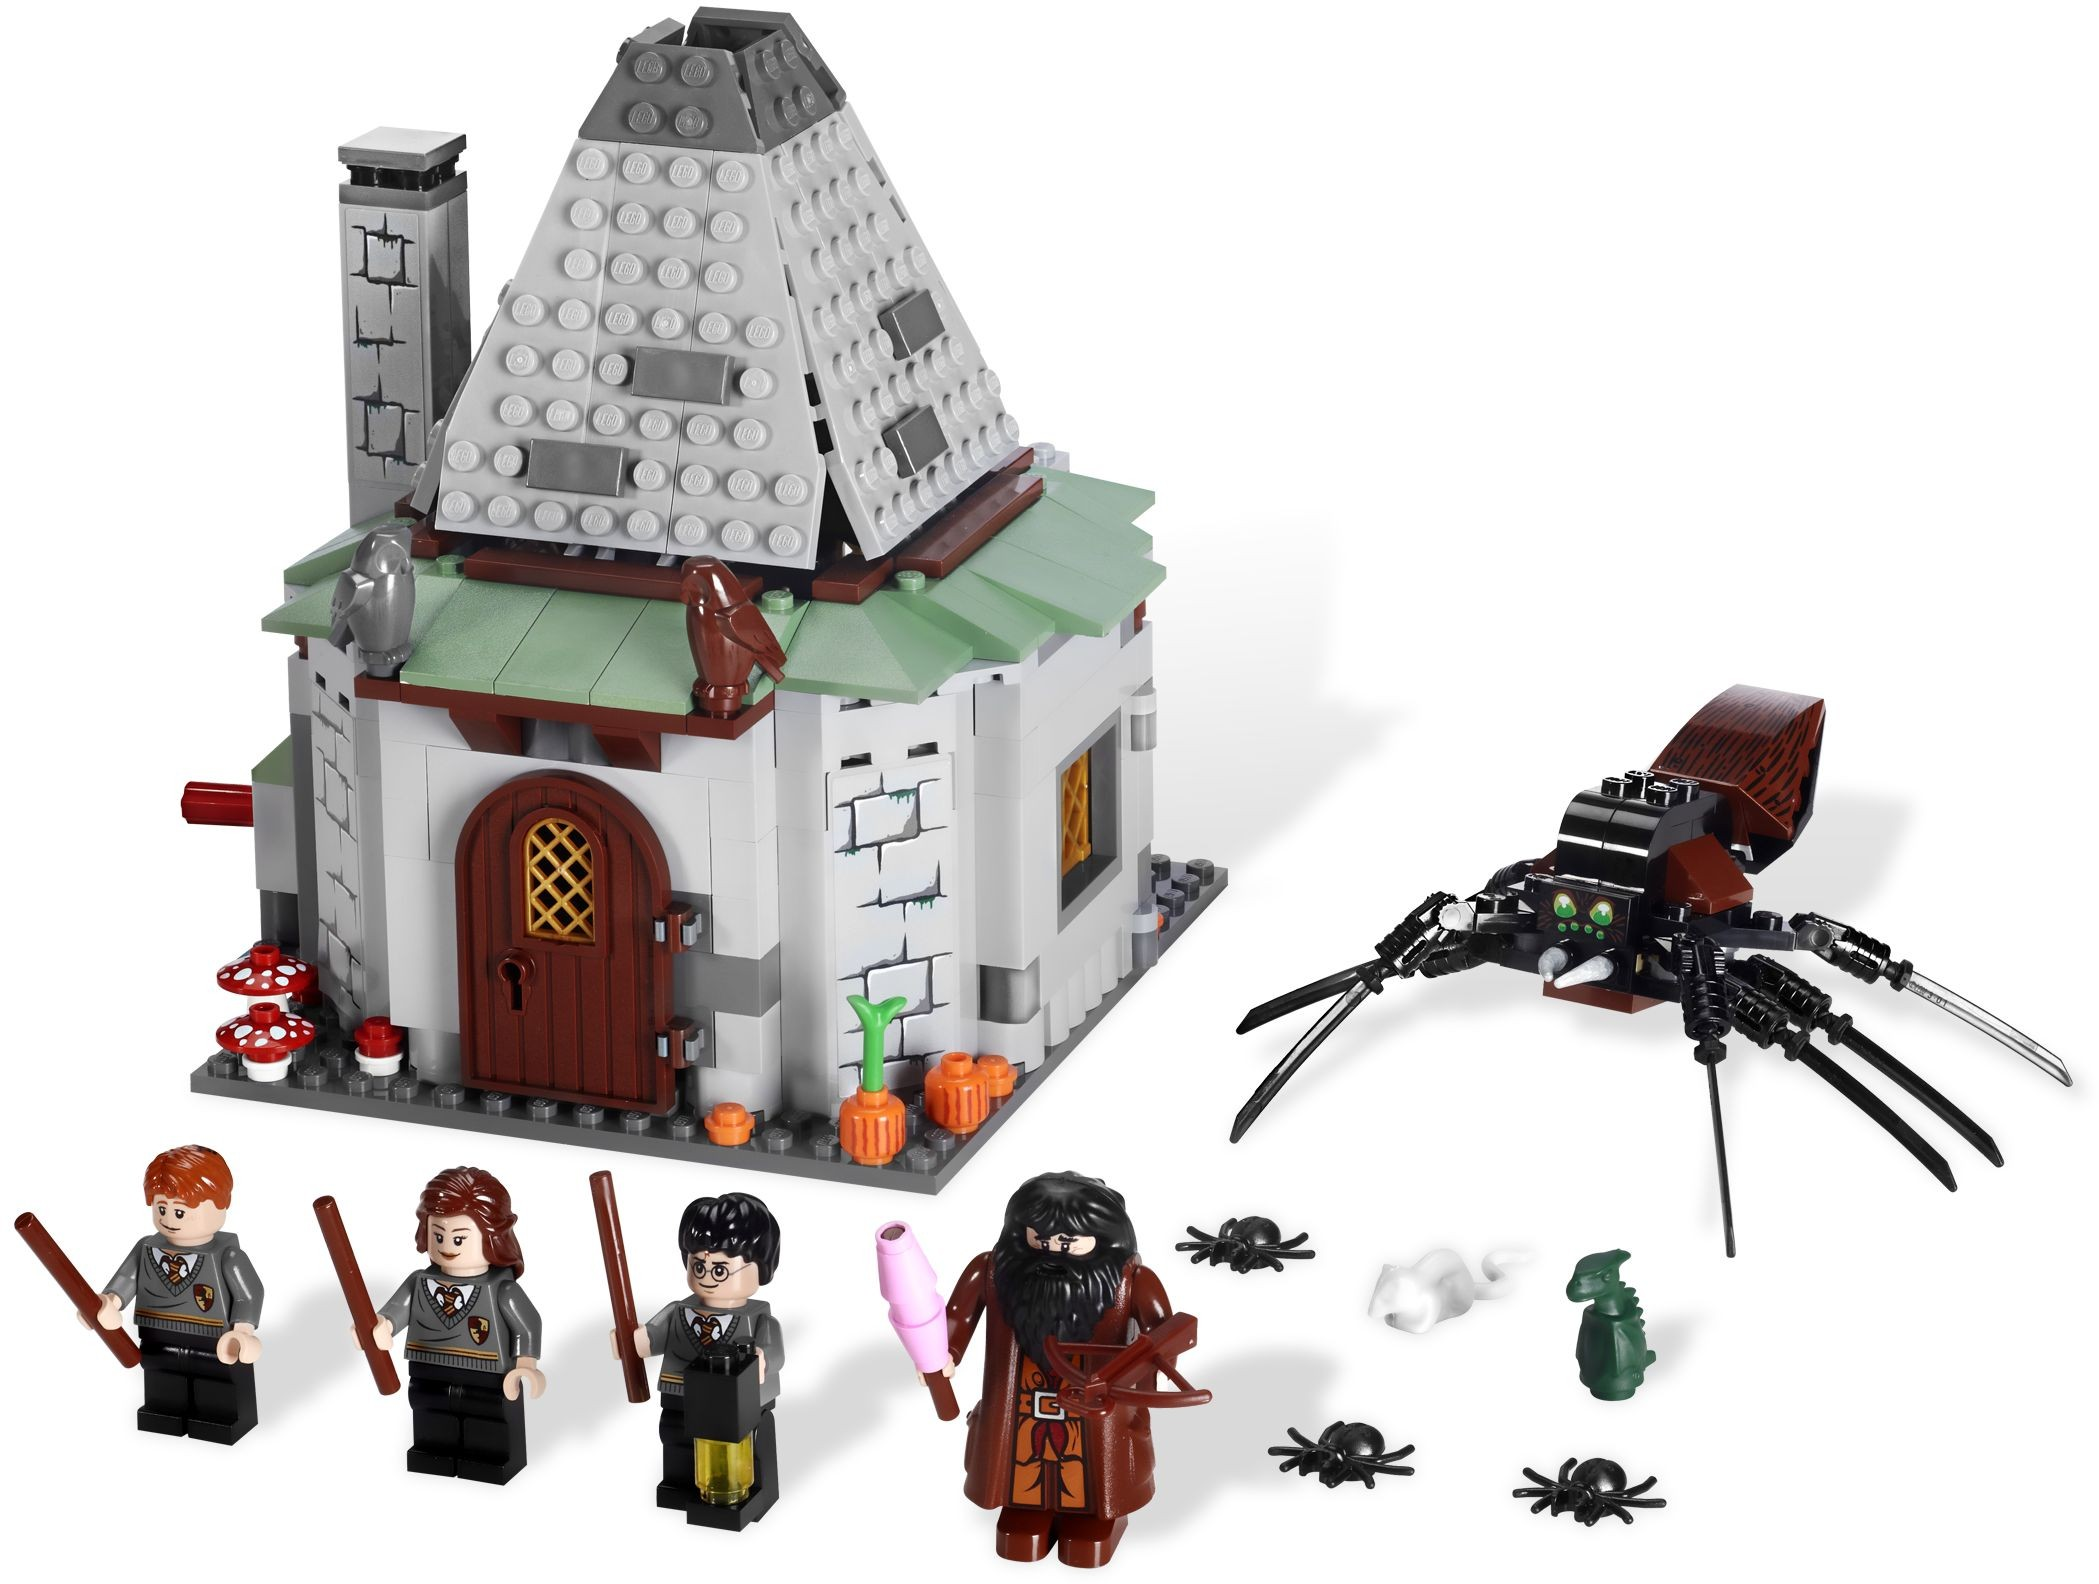 LEGO Harry Potter Professor Filius Flitwick w// Wand Minifigure 4842 Hogwarts